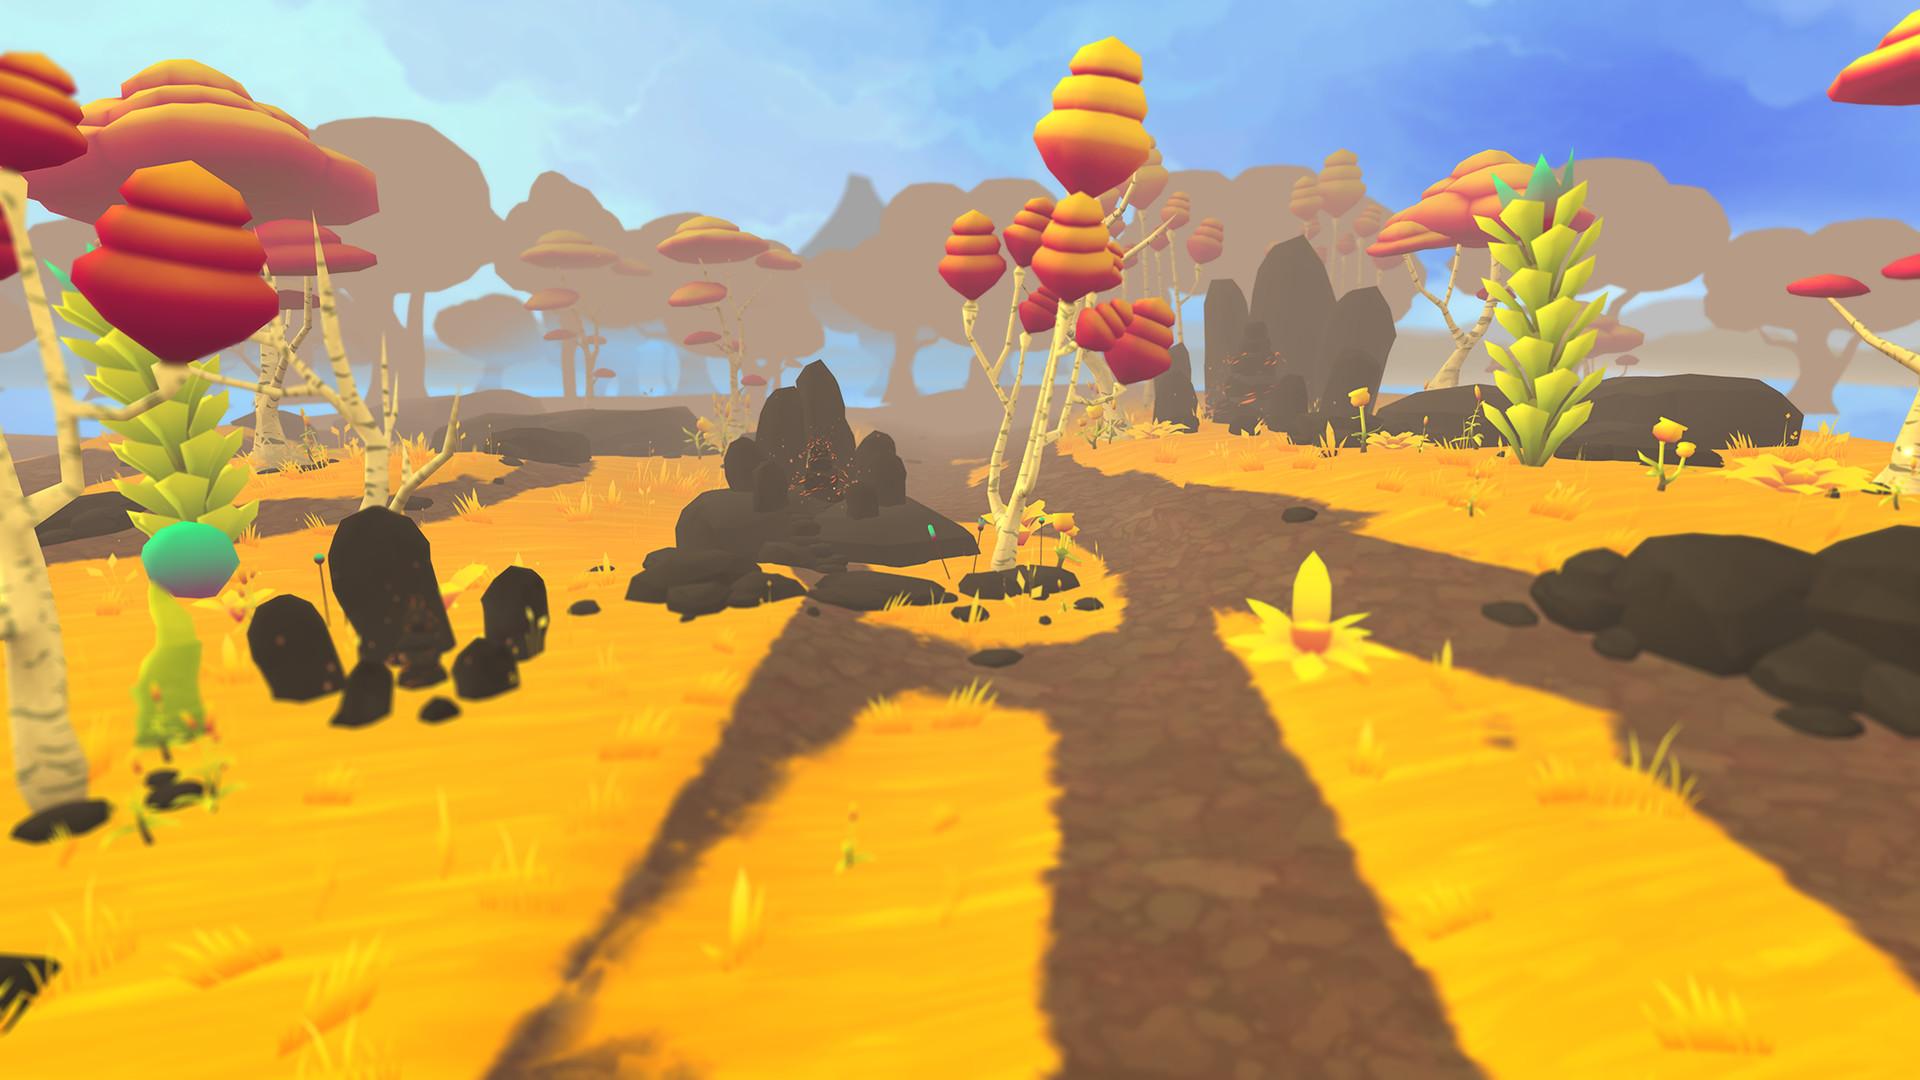 Puzzle VR game